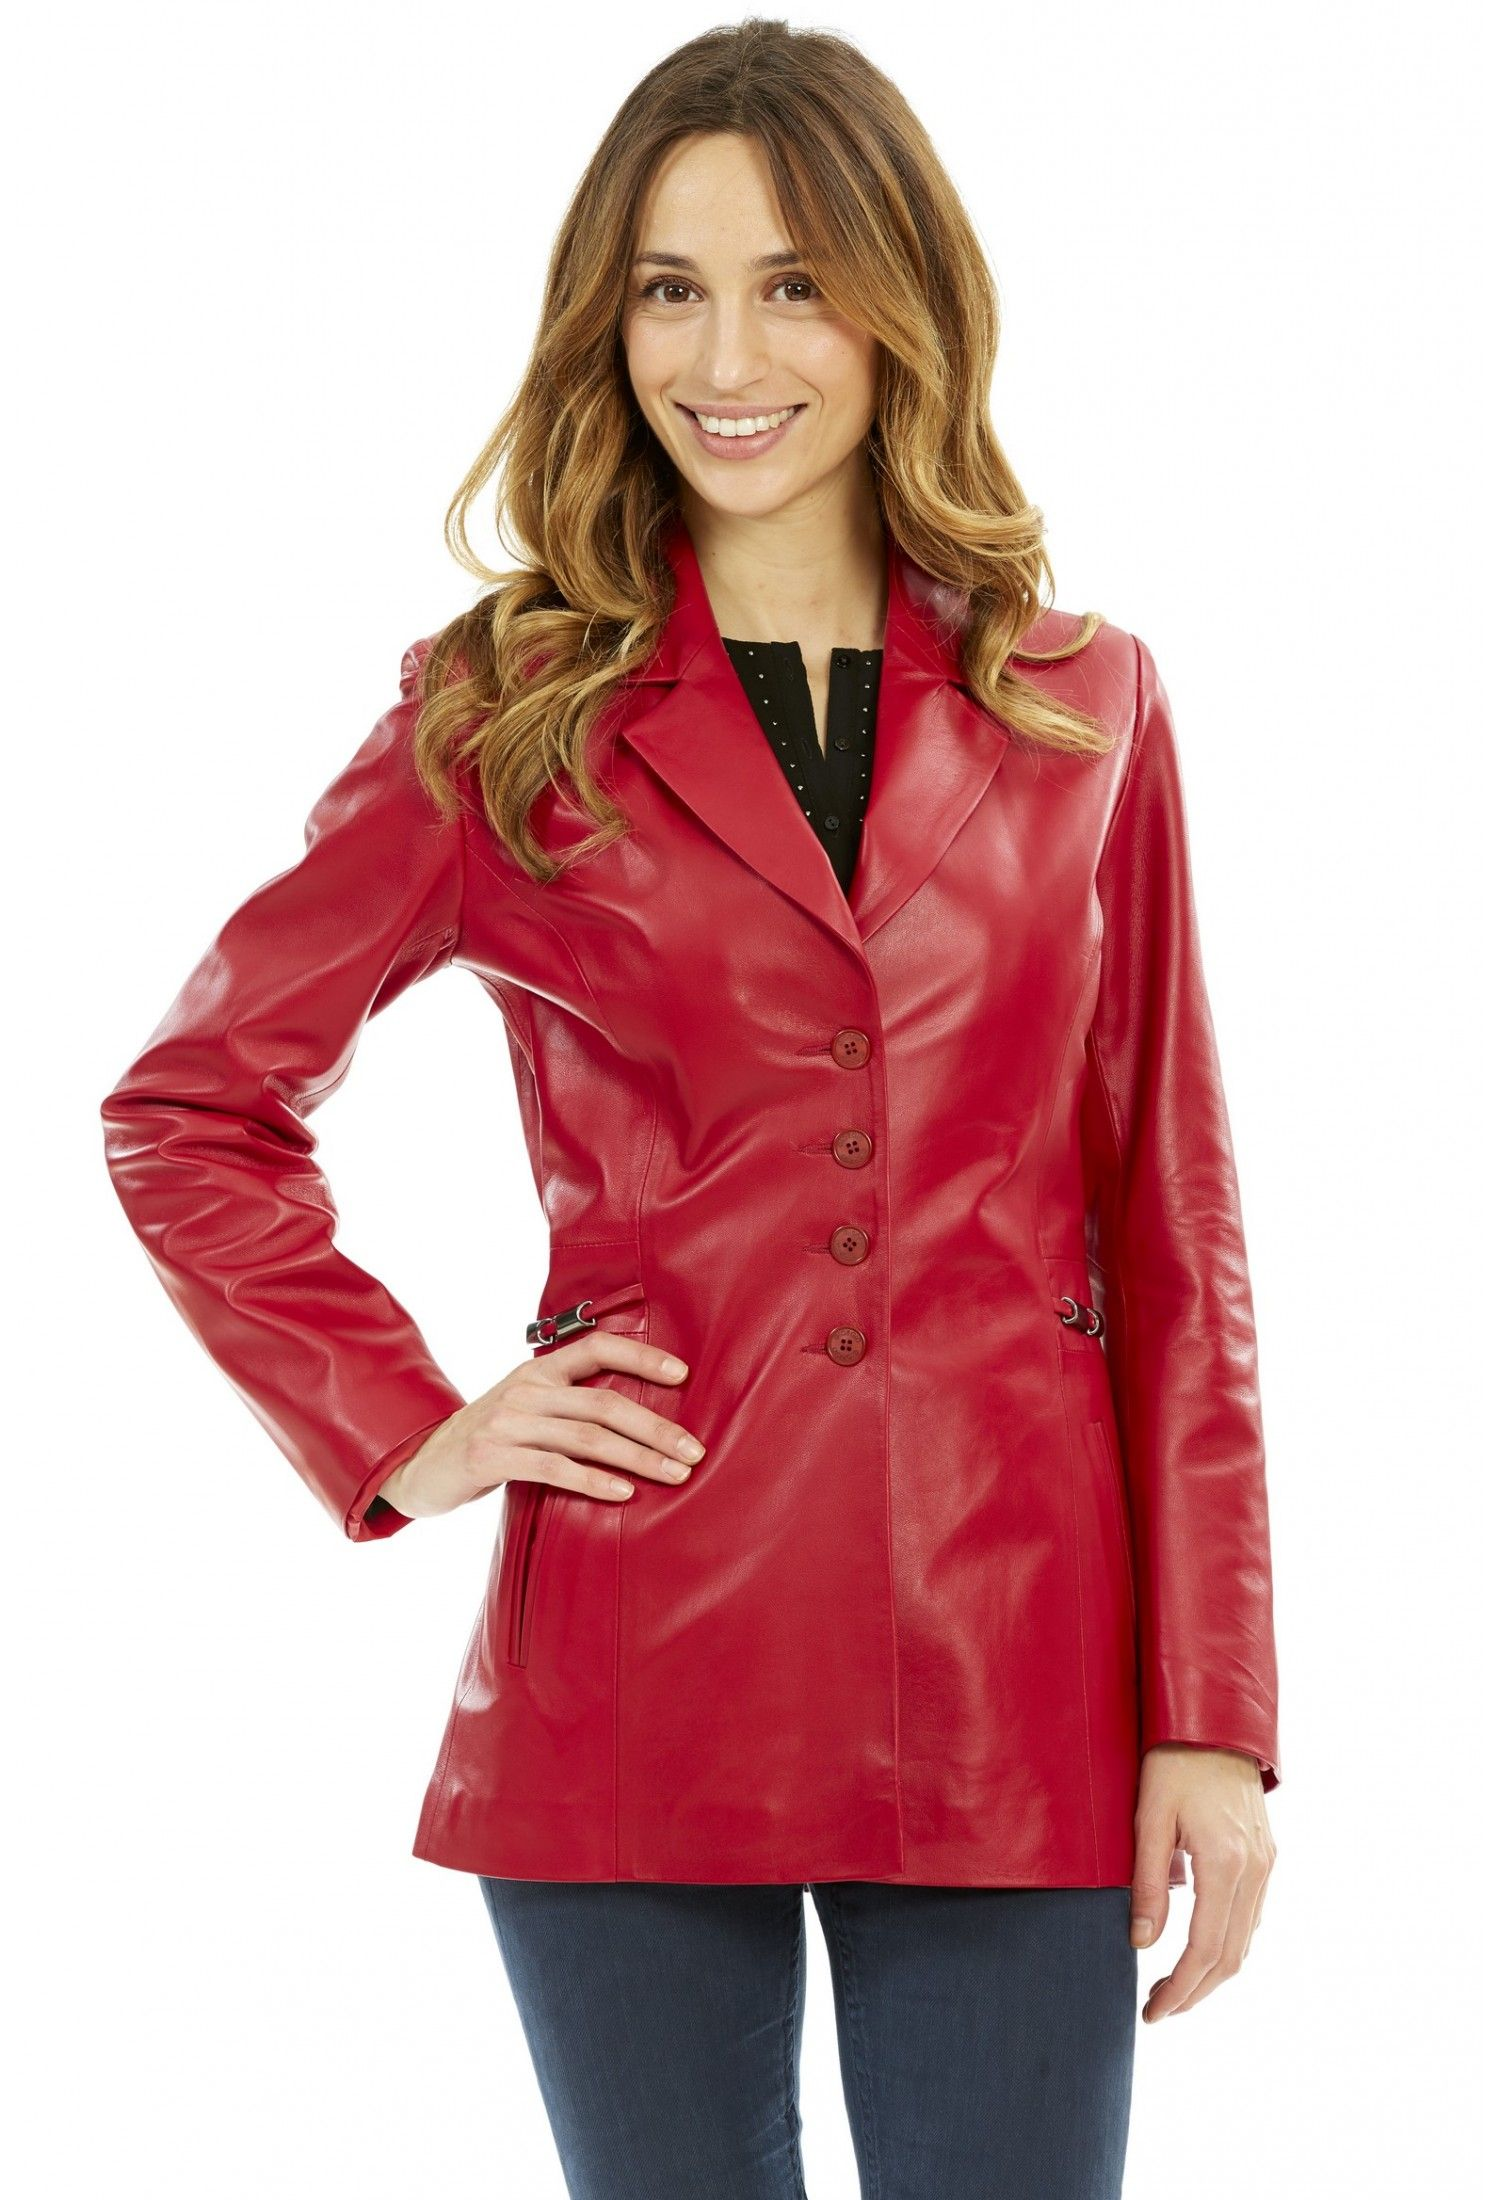 Veste femme style blazer